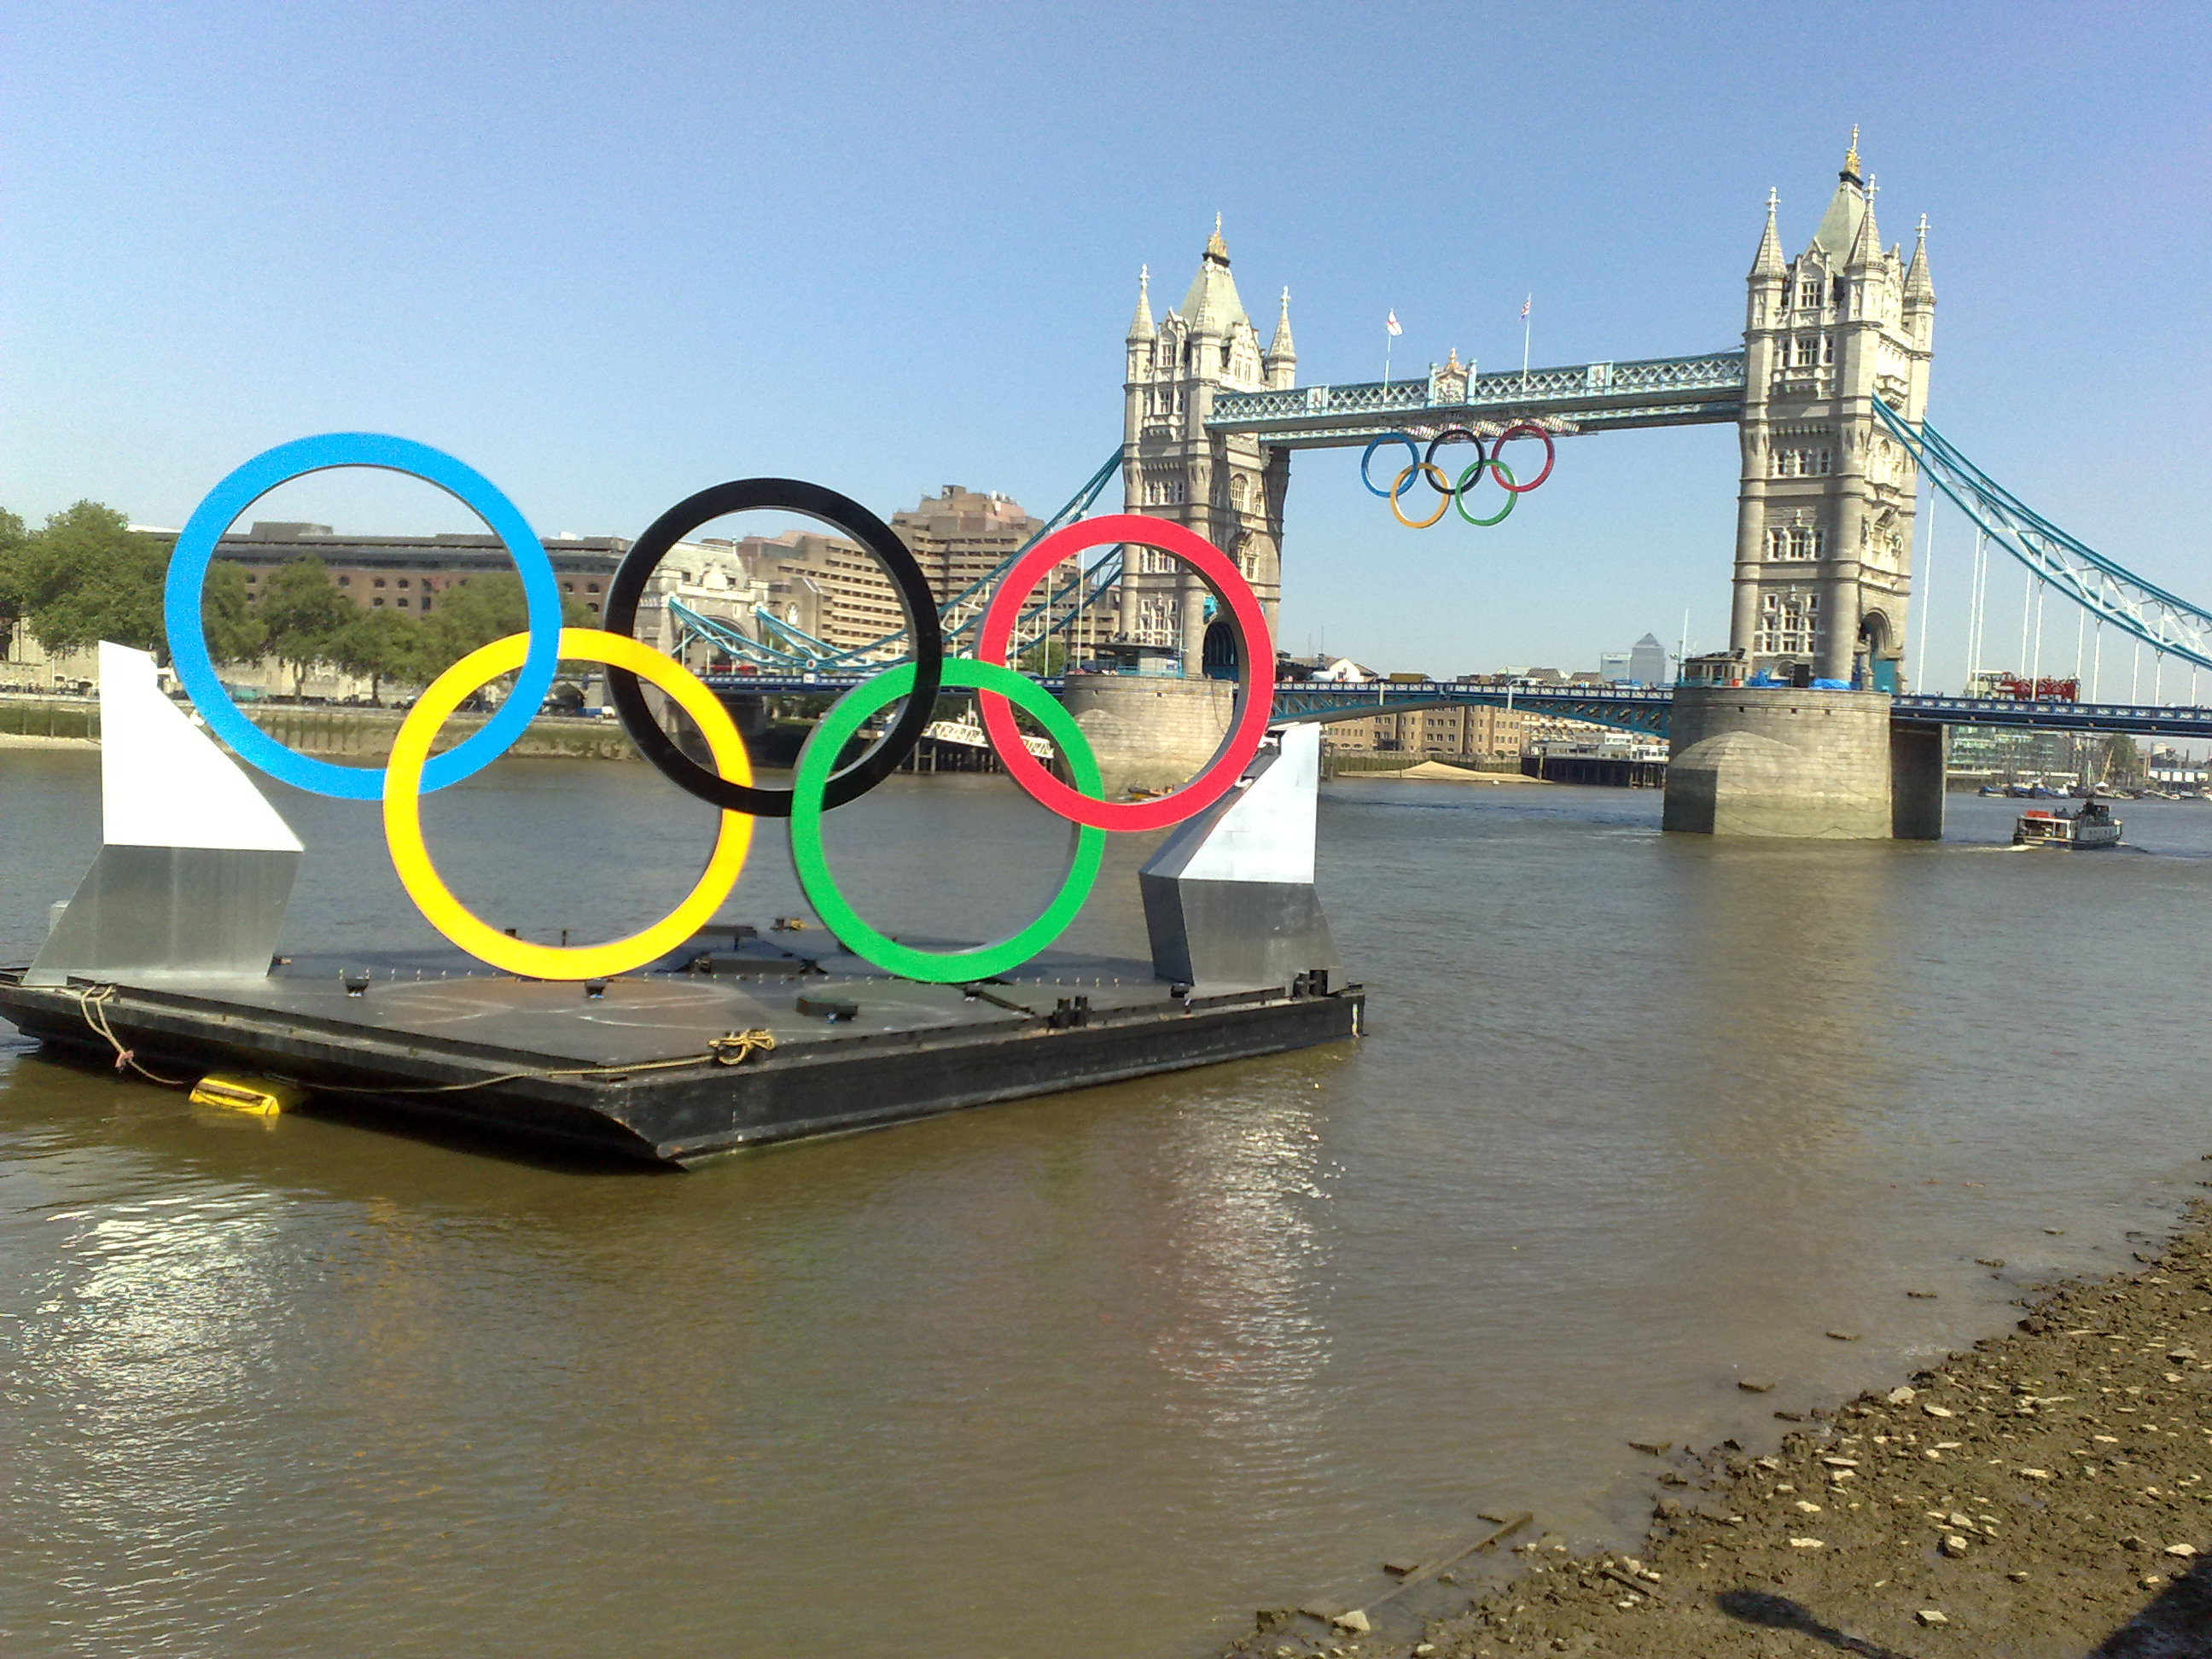 2012 Olympics, Olympics 2012, London Olympics, Olympics London, Olympic rings